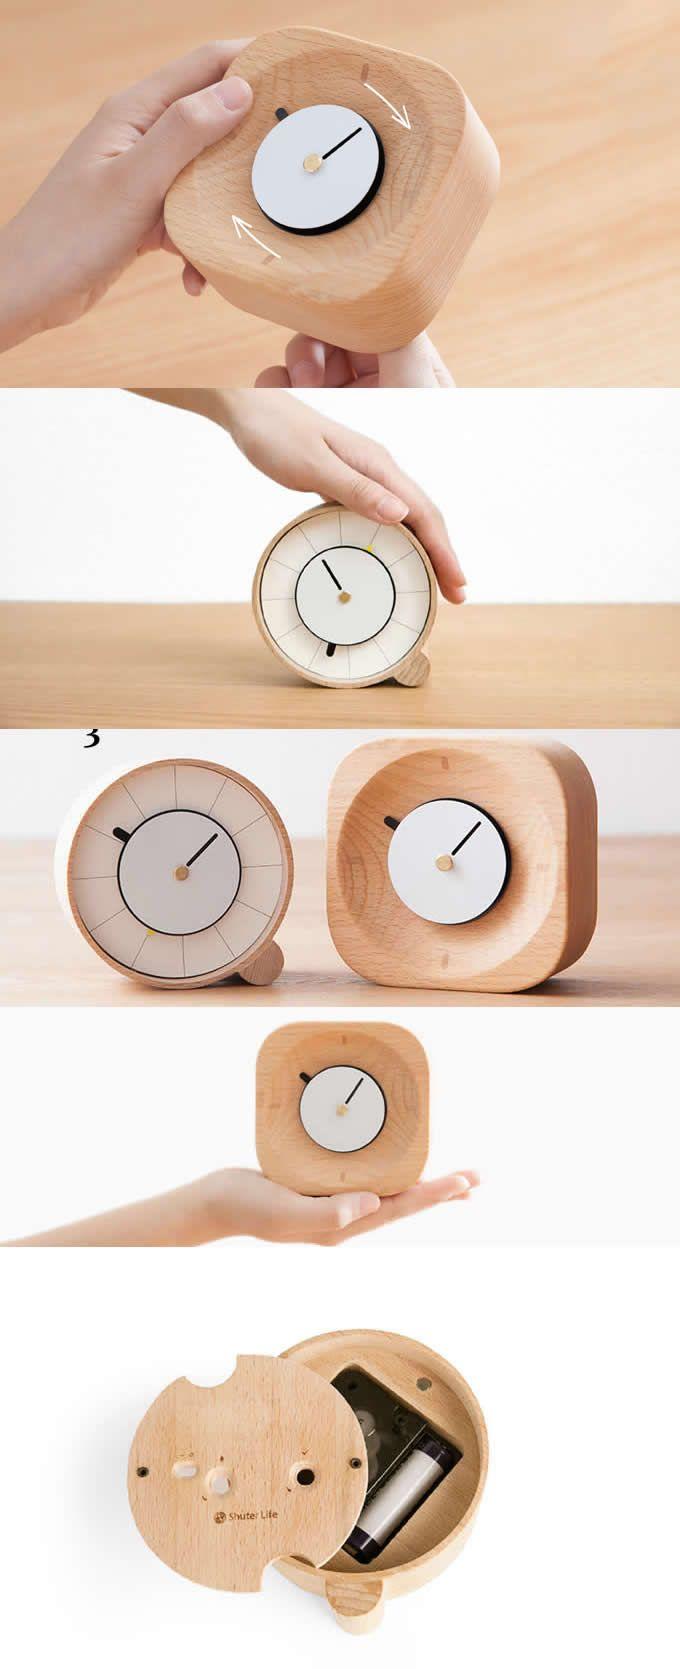 Wooden Desk Clock Art Deco Style Handmade Wood Desk Clock Made